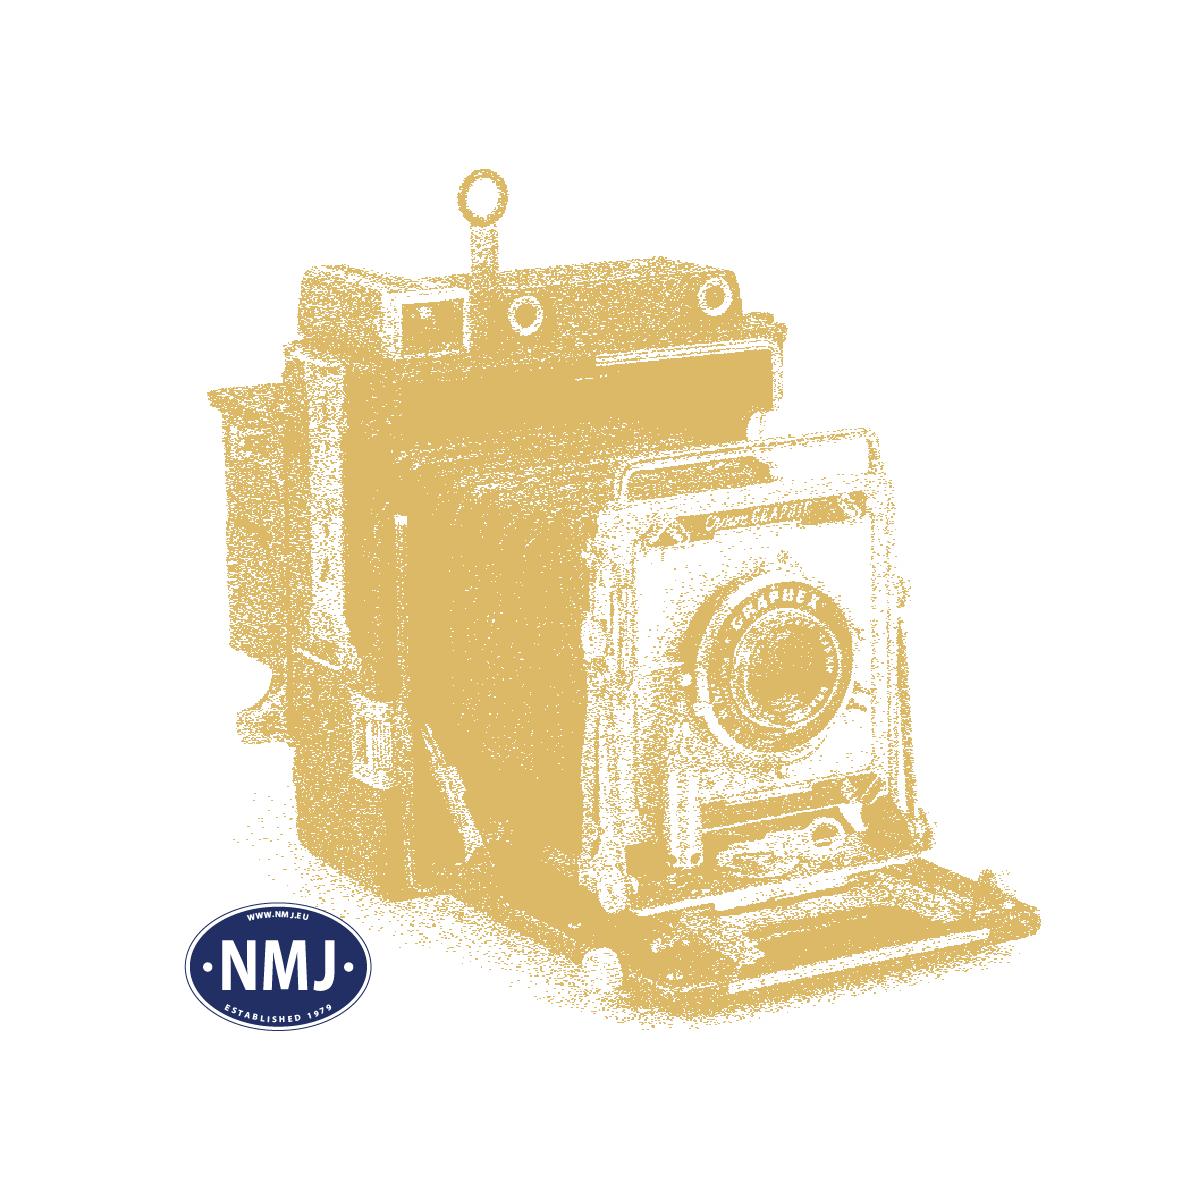 NMJSCM18249 - NMJ Superline NSB Cm 18249, DCC Digital